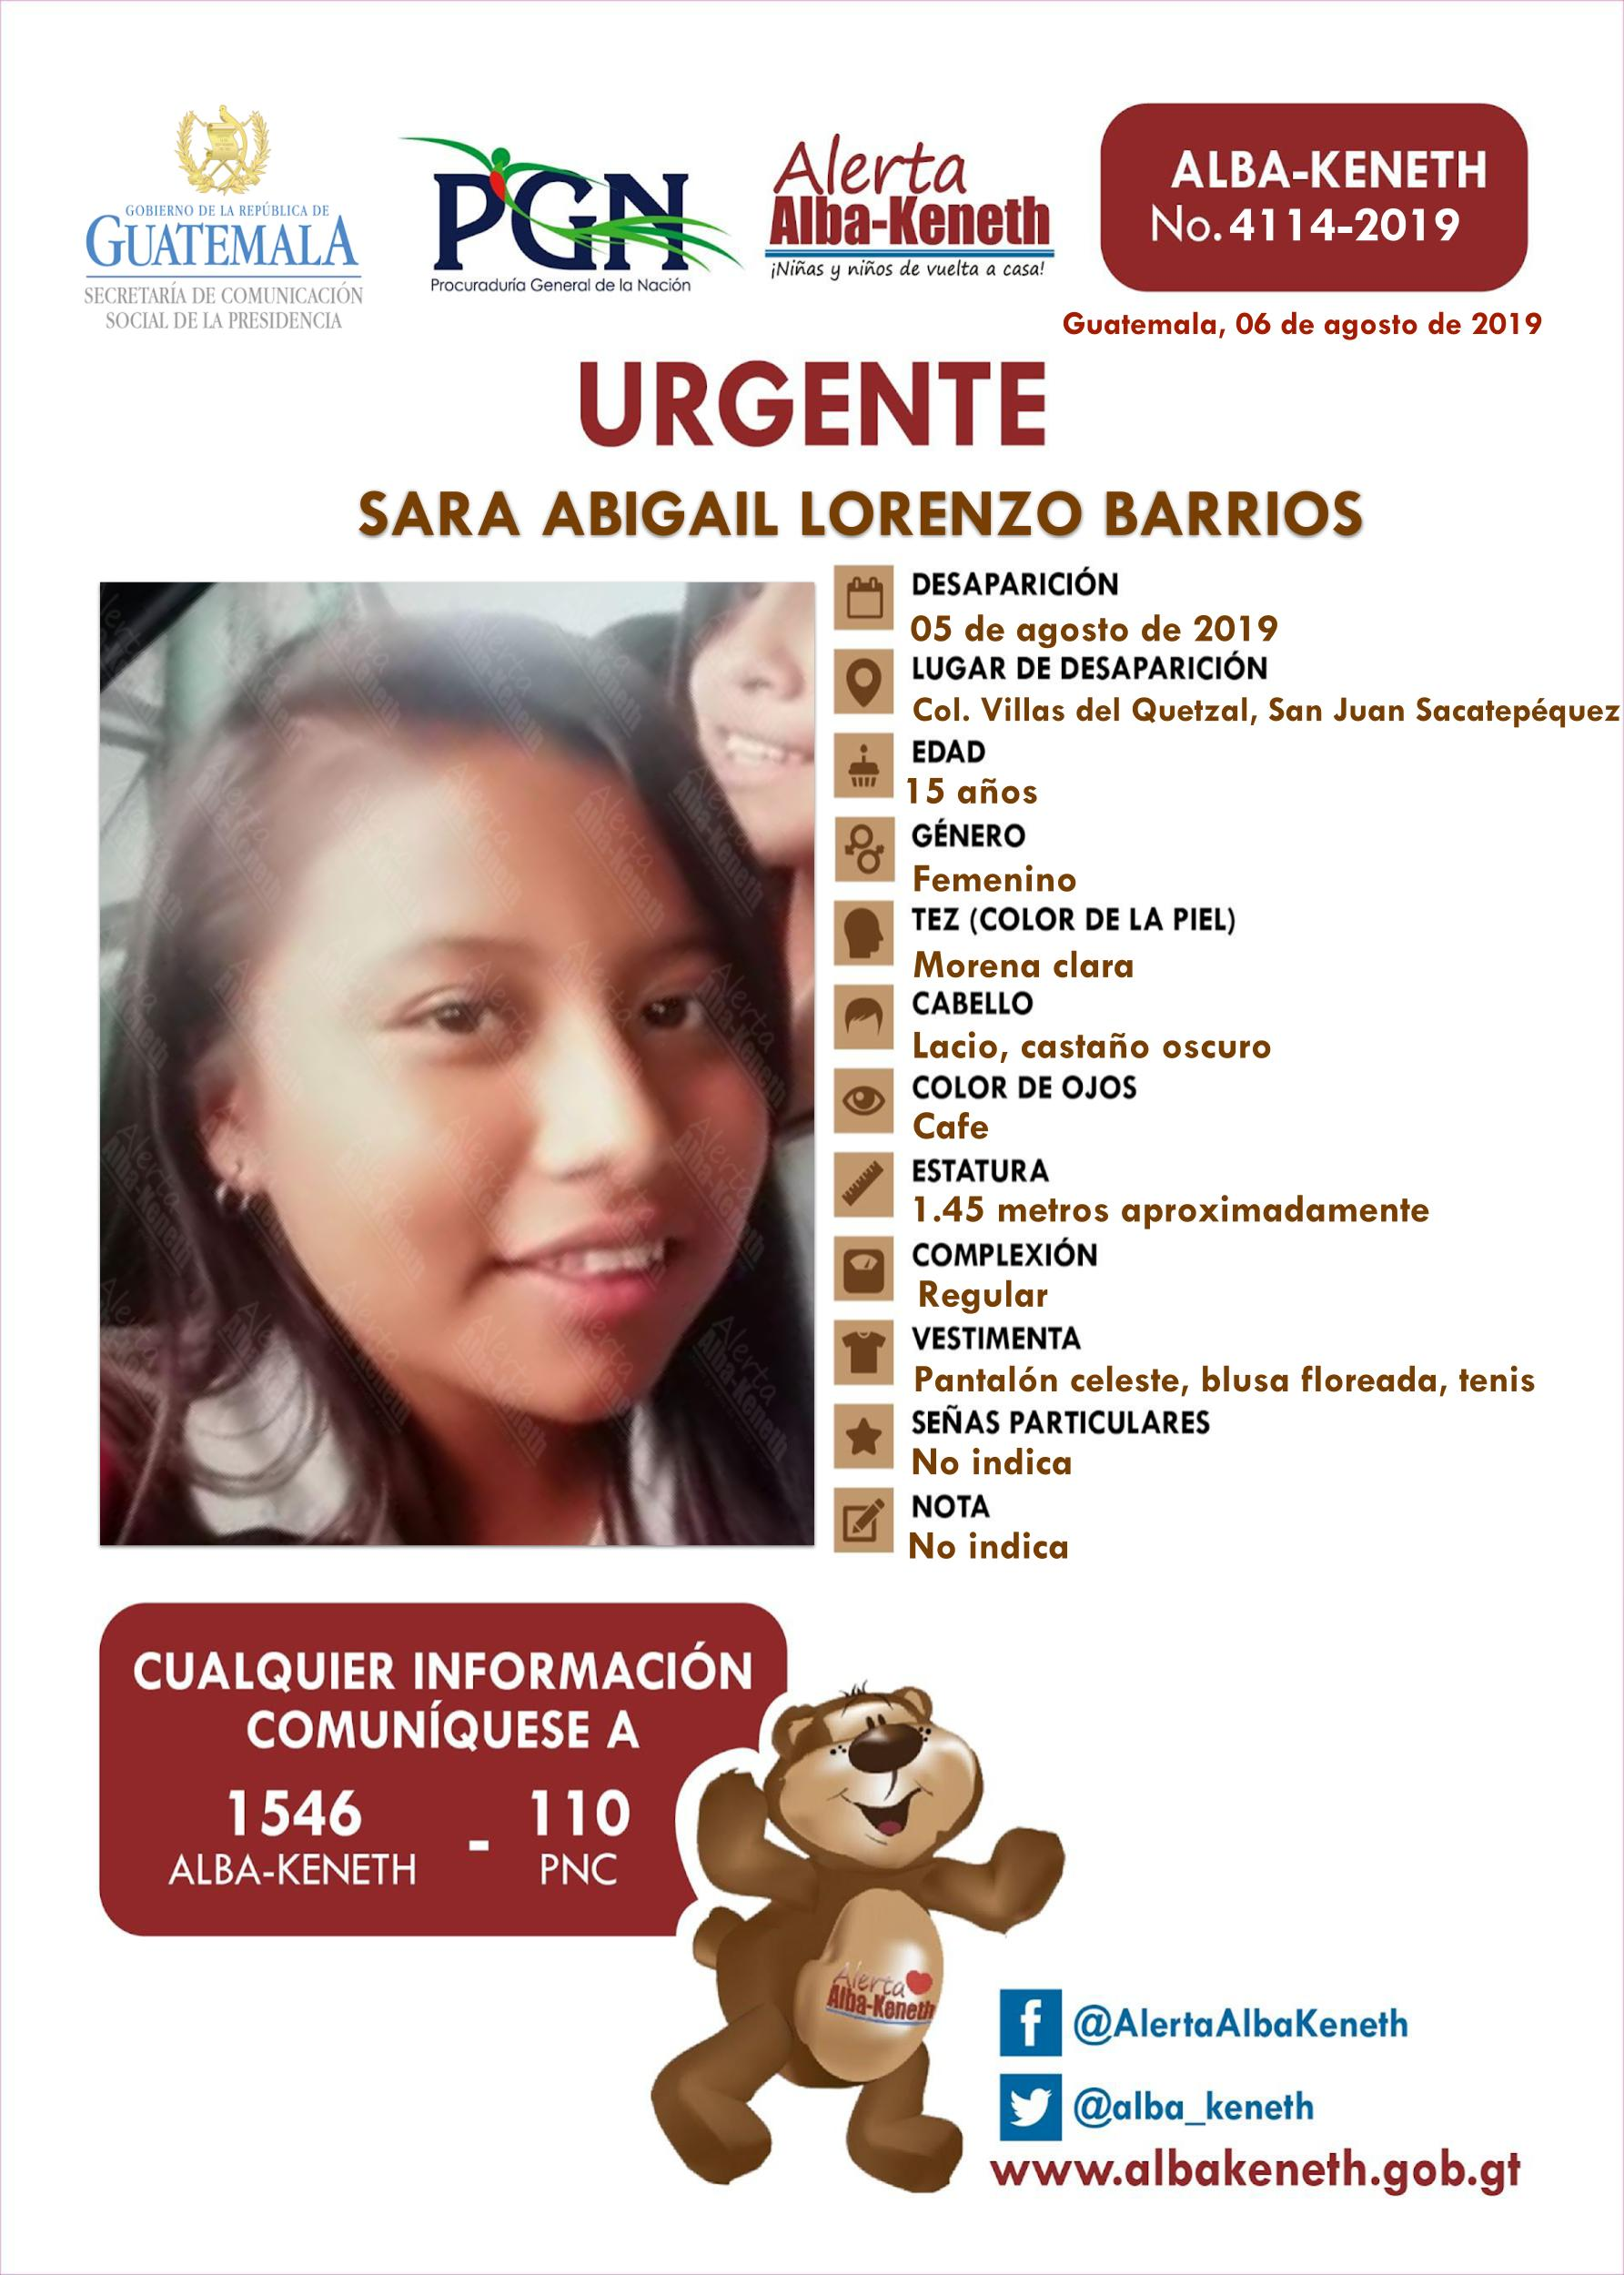 Sara Abigail Lorenzo Barrios